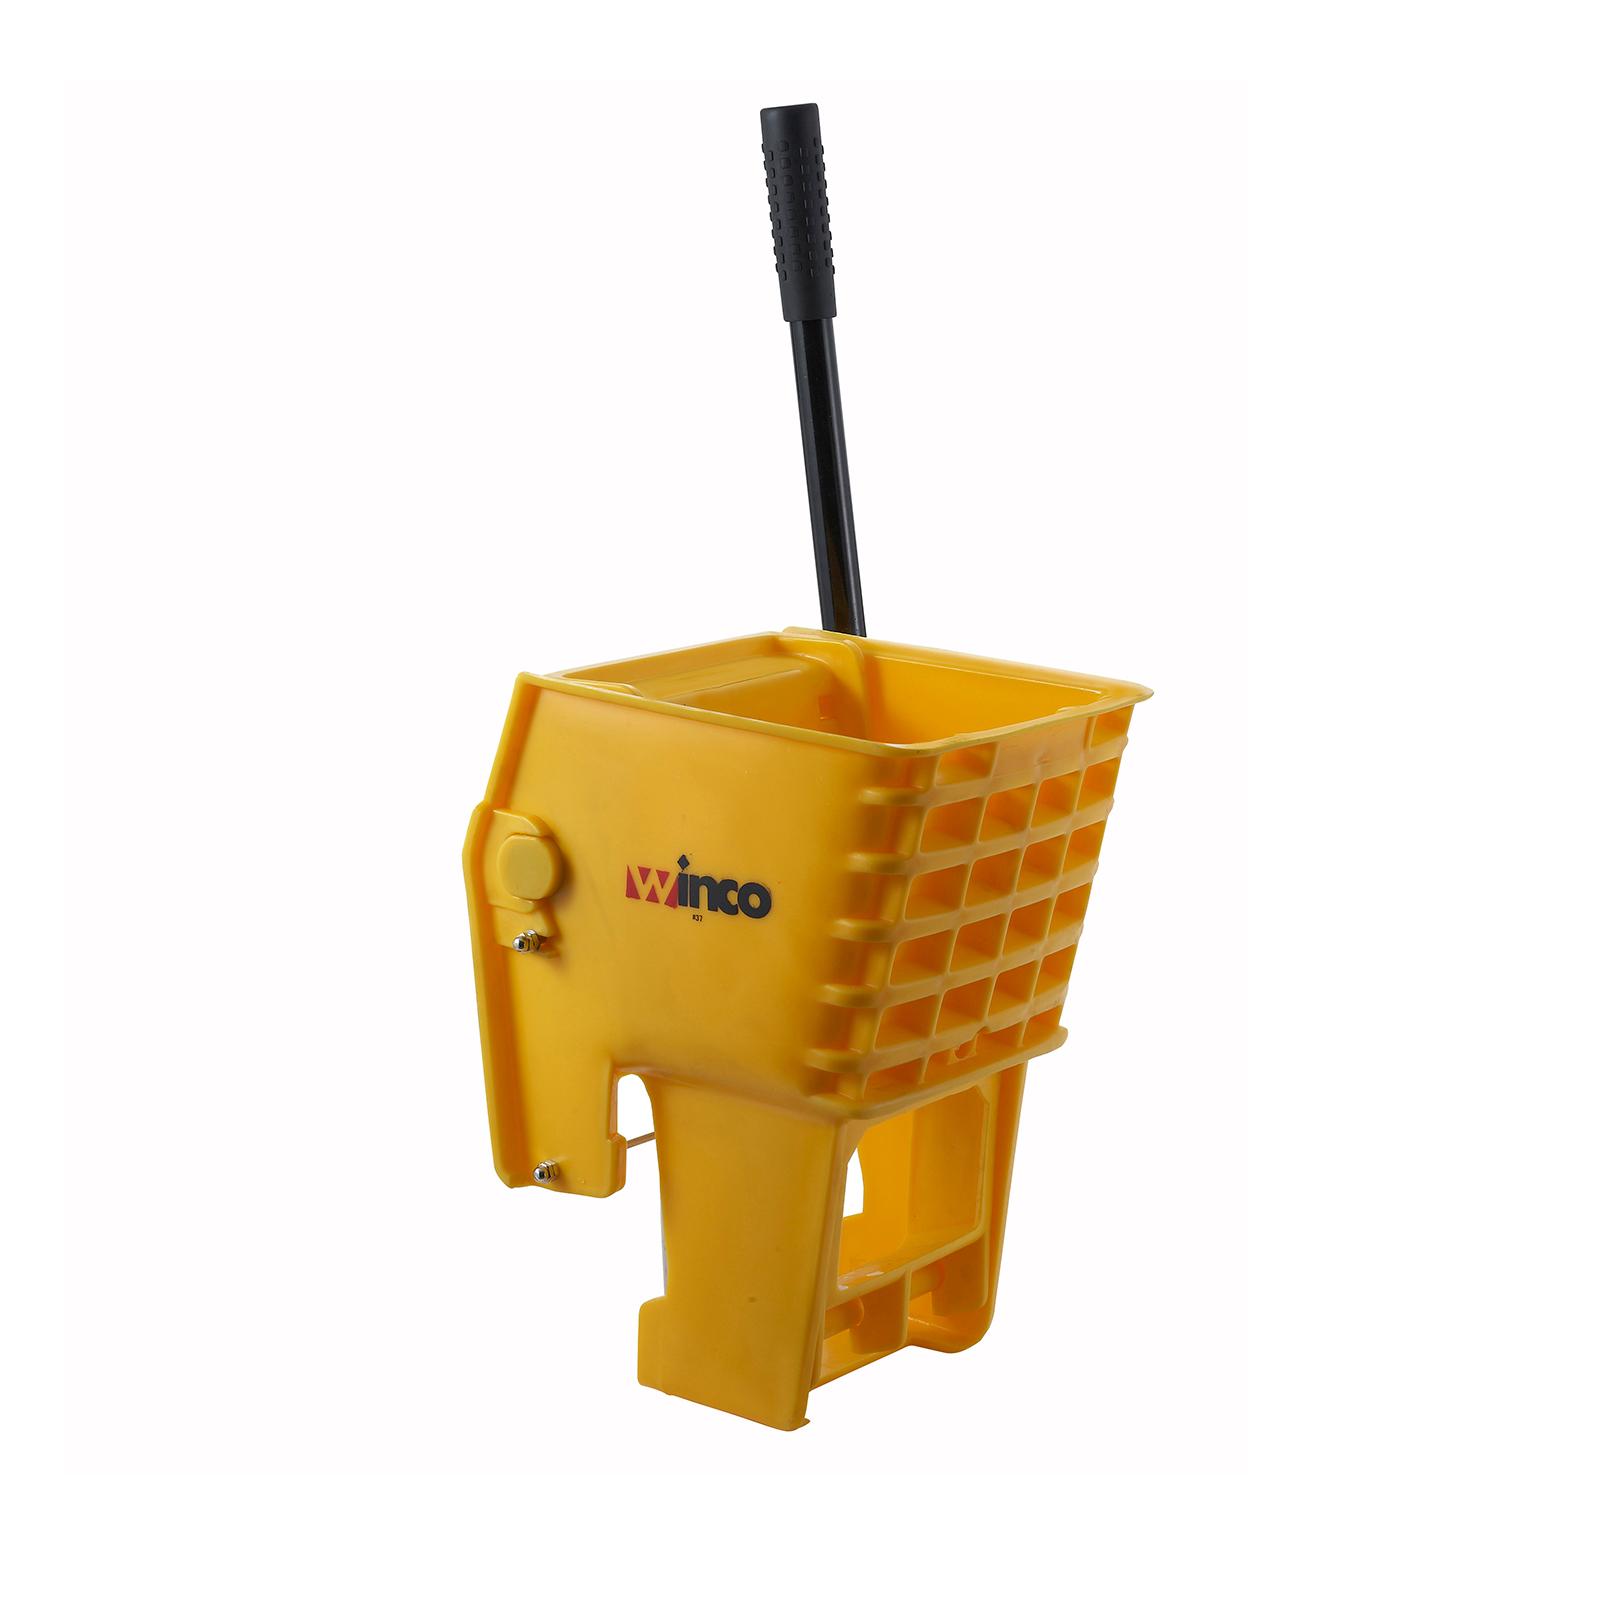 3700-185 Winco MPB-36W mop wringer